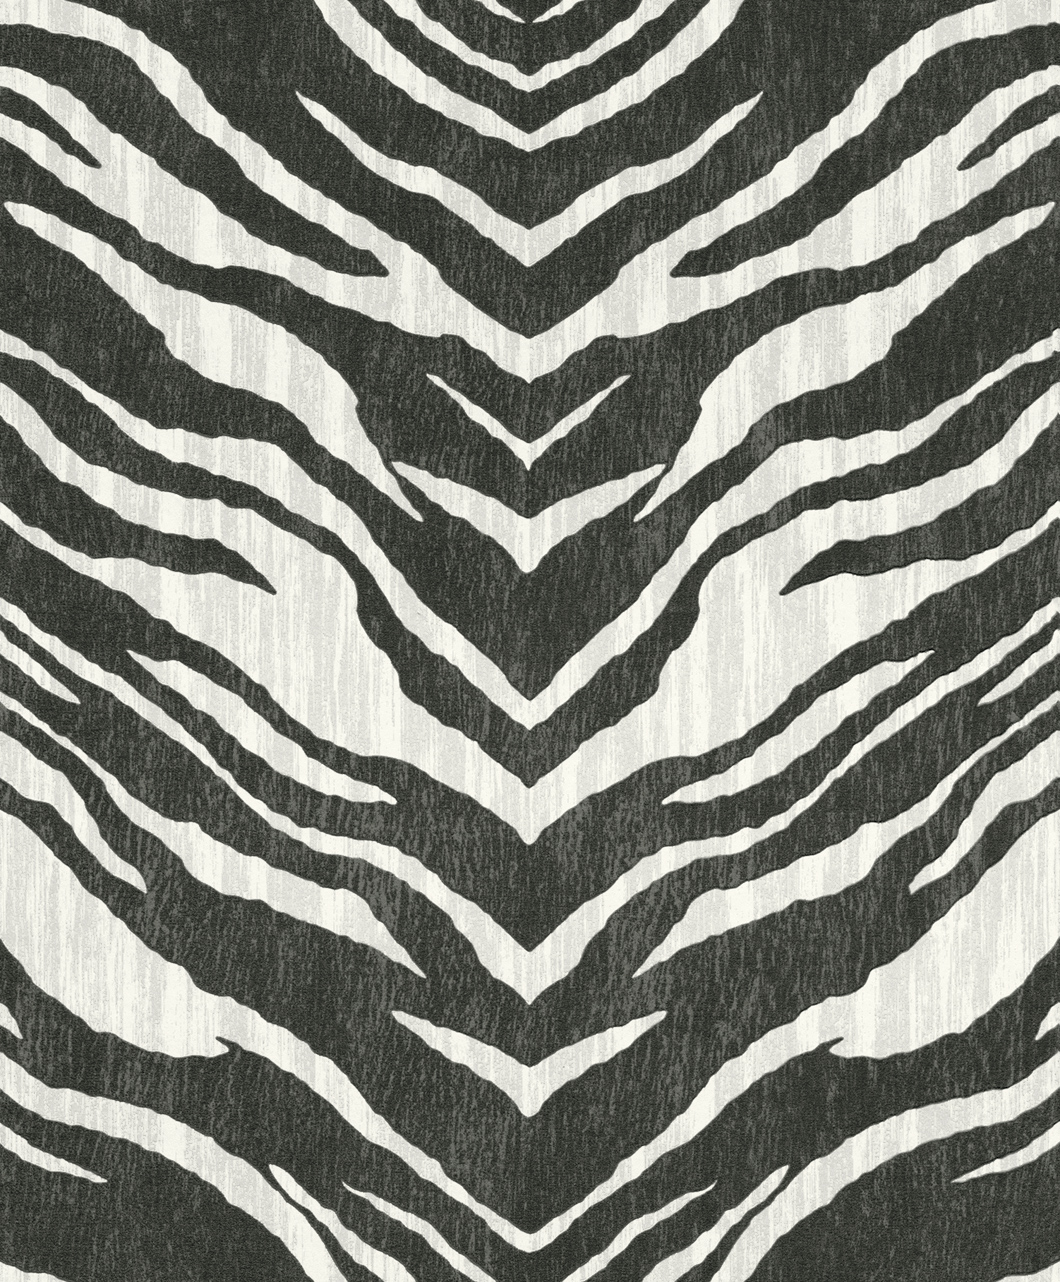 rasch tapete barbara becker 2014 452709 vlies neu afrika zebra schwarz wei ebay. Black Bedroom Furniture Sets. Home Design Ideas